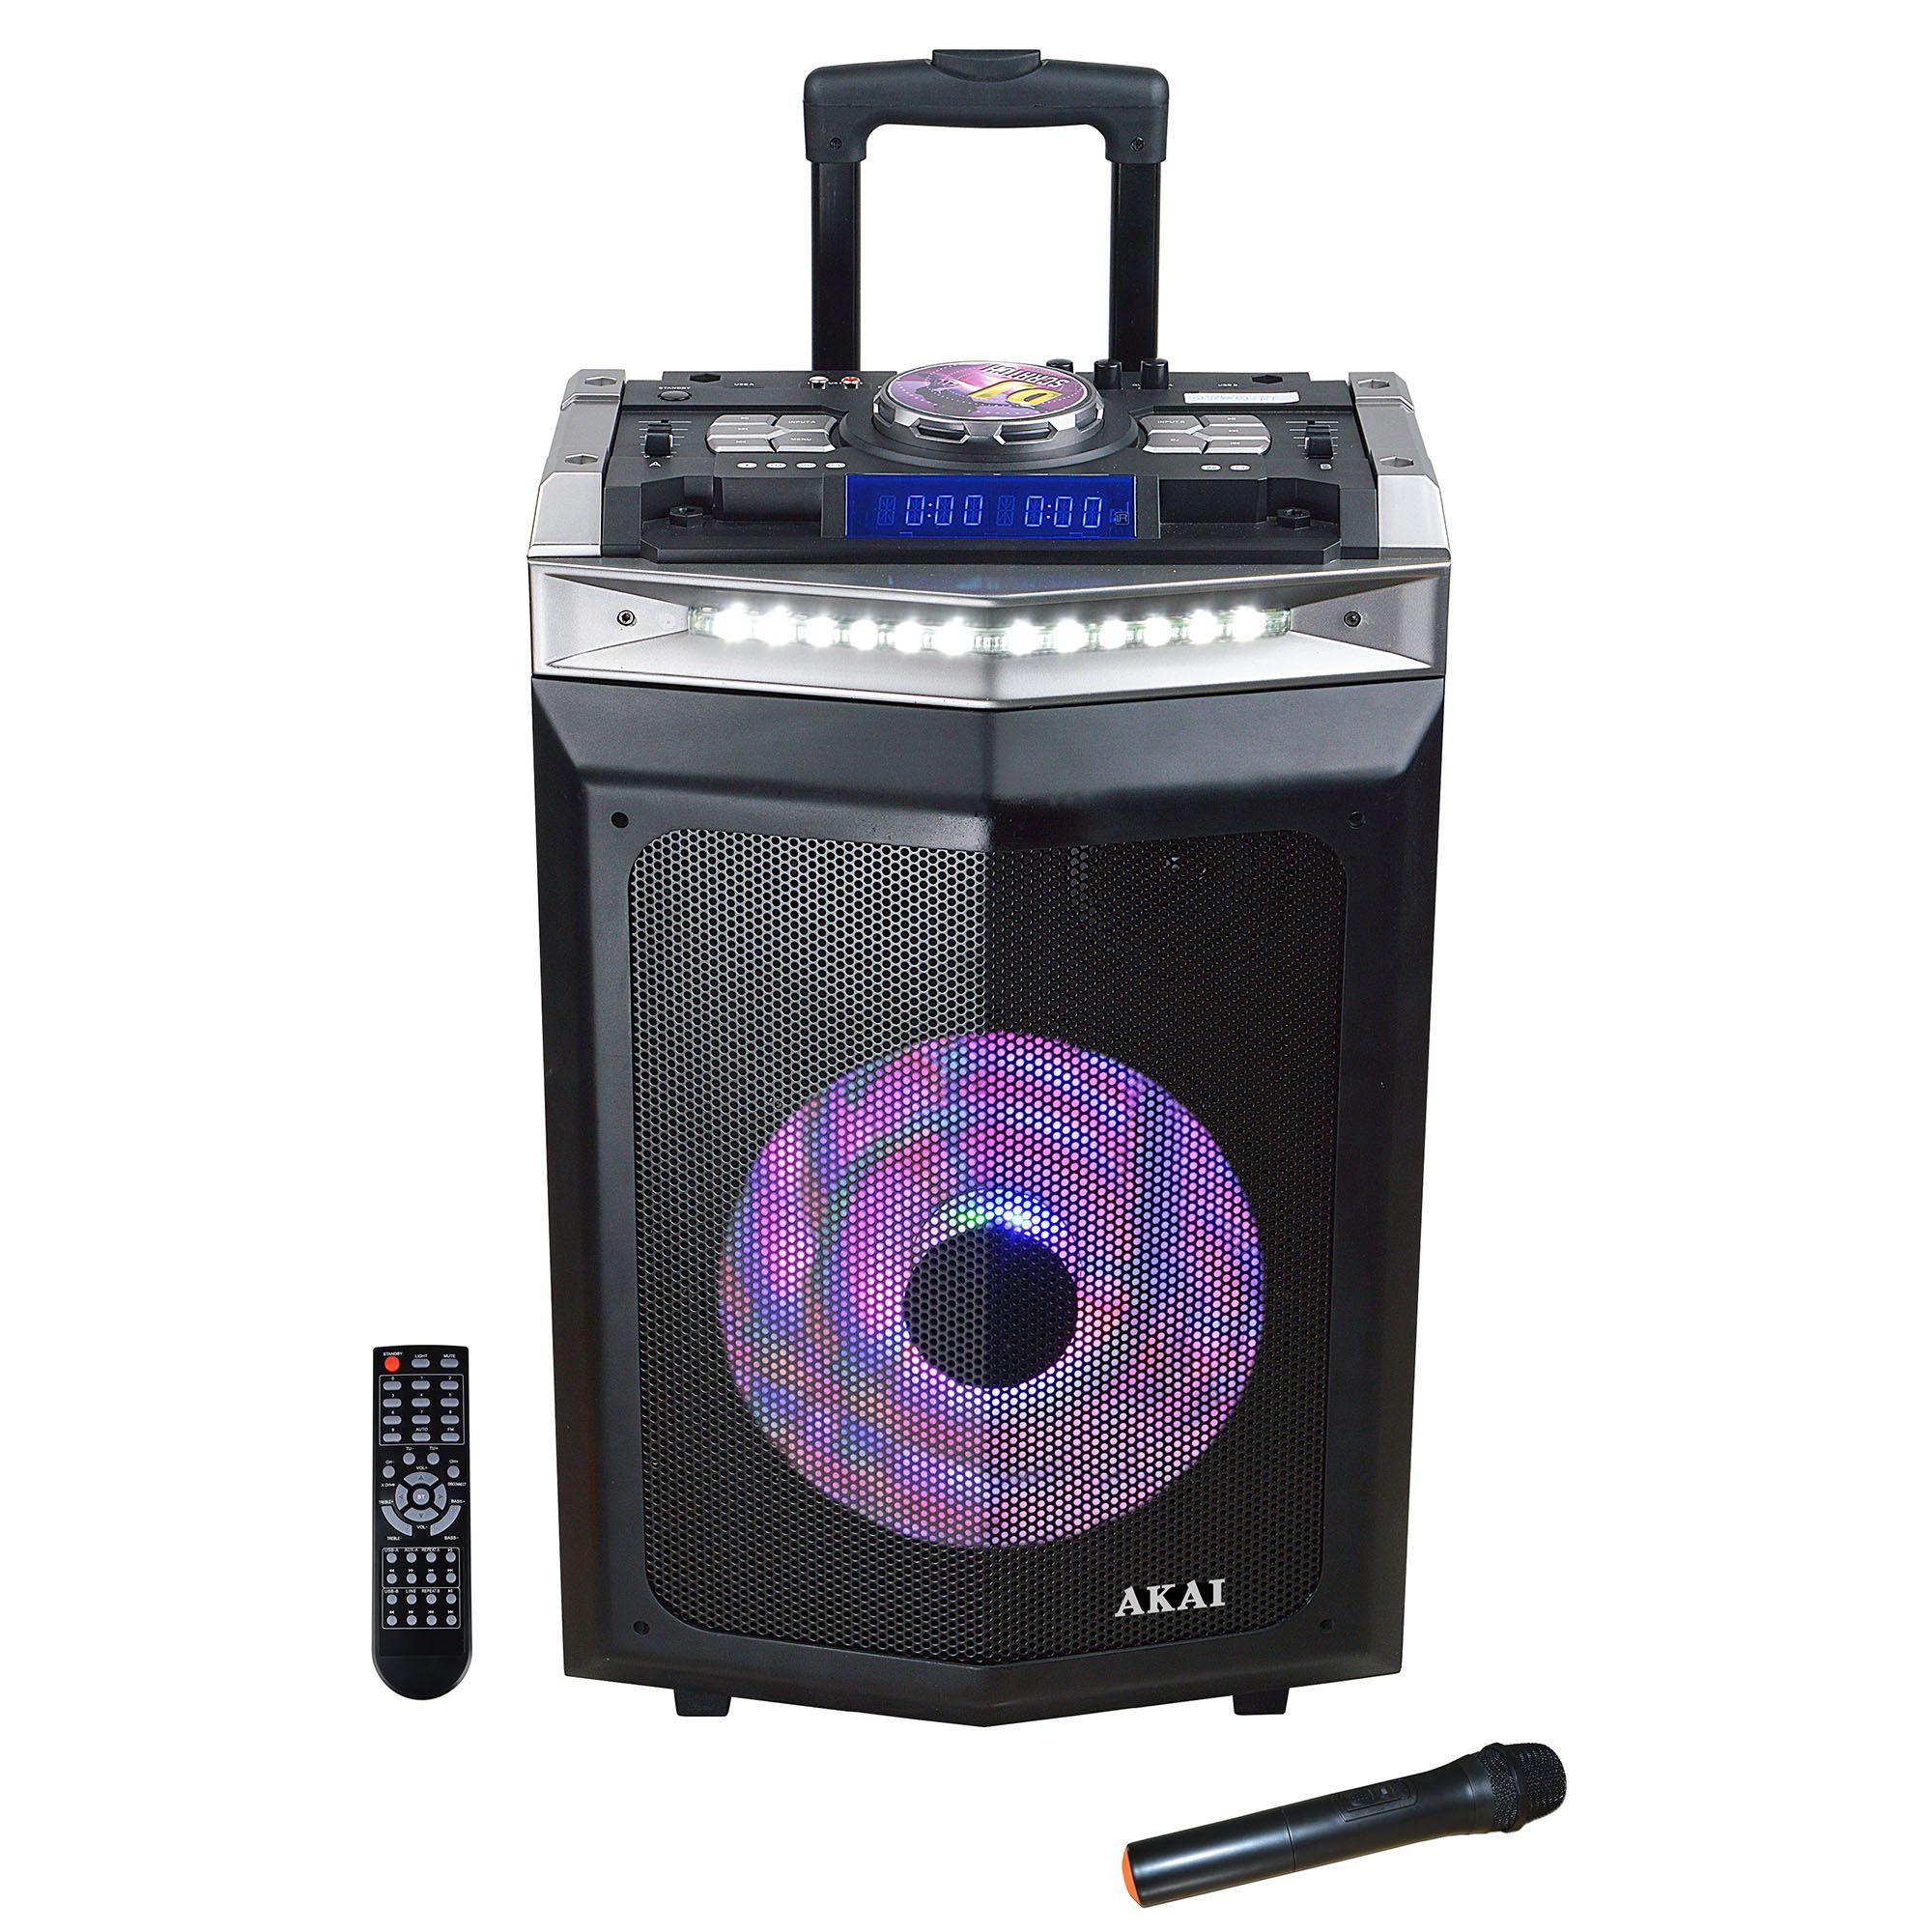 Boxa Portabila AKAI DJ-6112BT Bluetooth DJ Mixer 120W